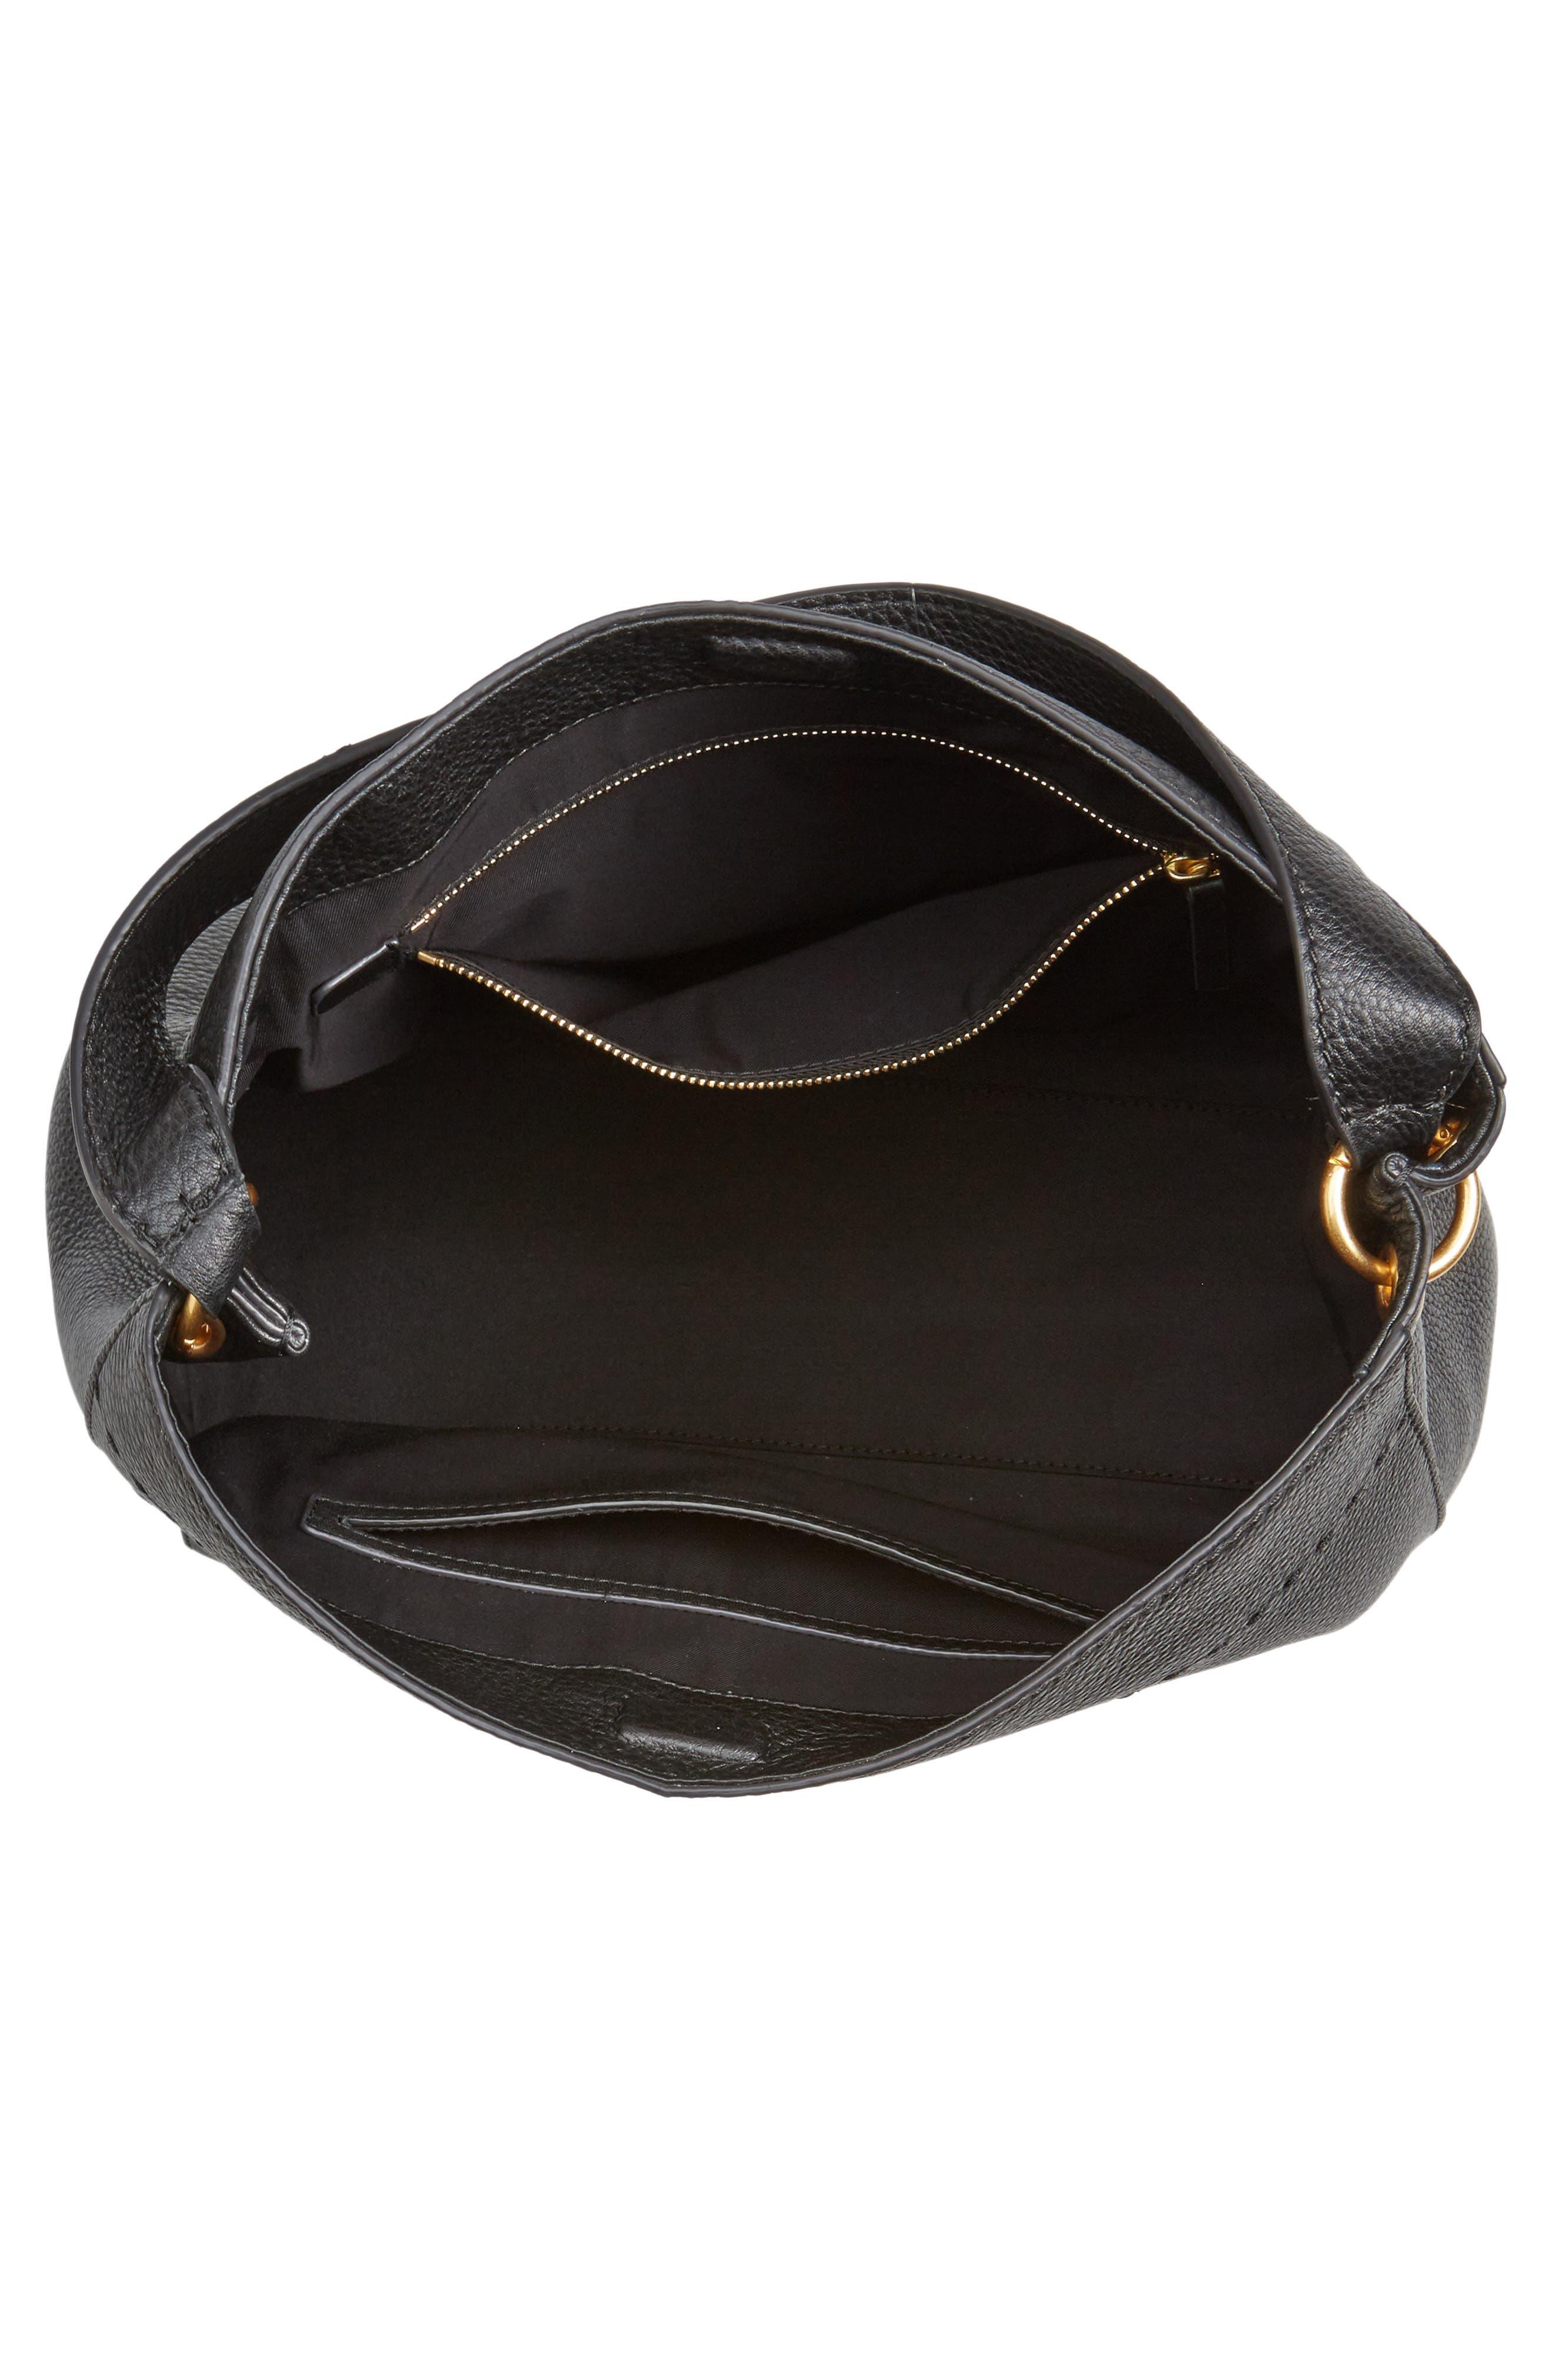 McGraw Leather Hobo,                             Alternate thumbnail 4, color,                             BLACK